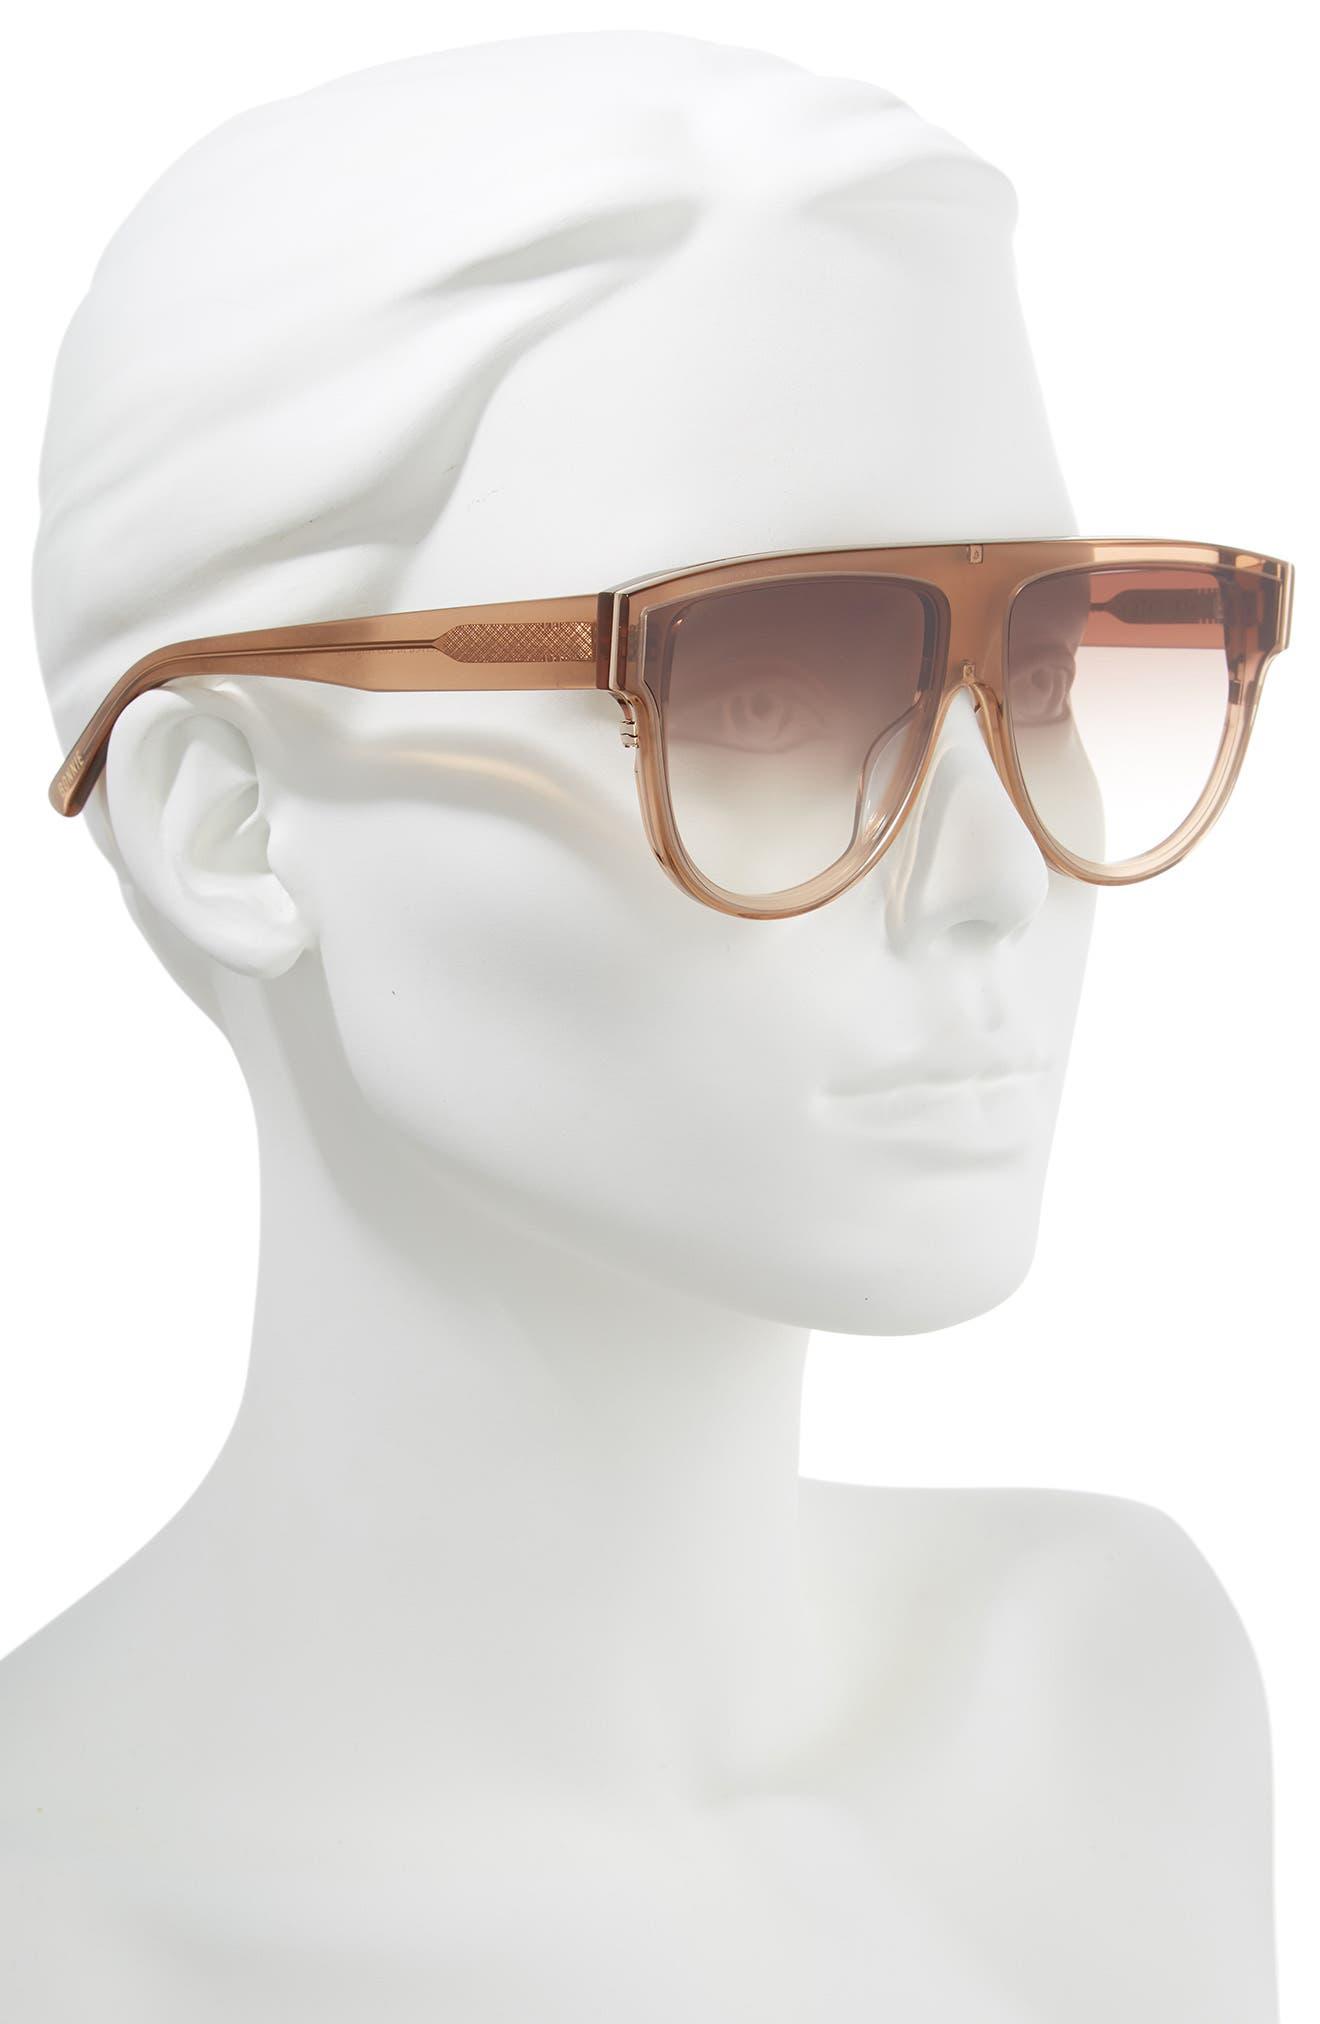 Continuum 63mm Oversize Flat Top Sunglasses,                             Alternate thumbnail 2, color,                             AMBER GRADIENT